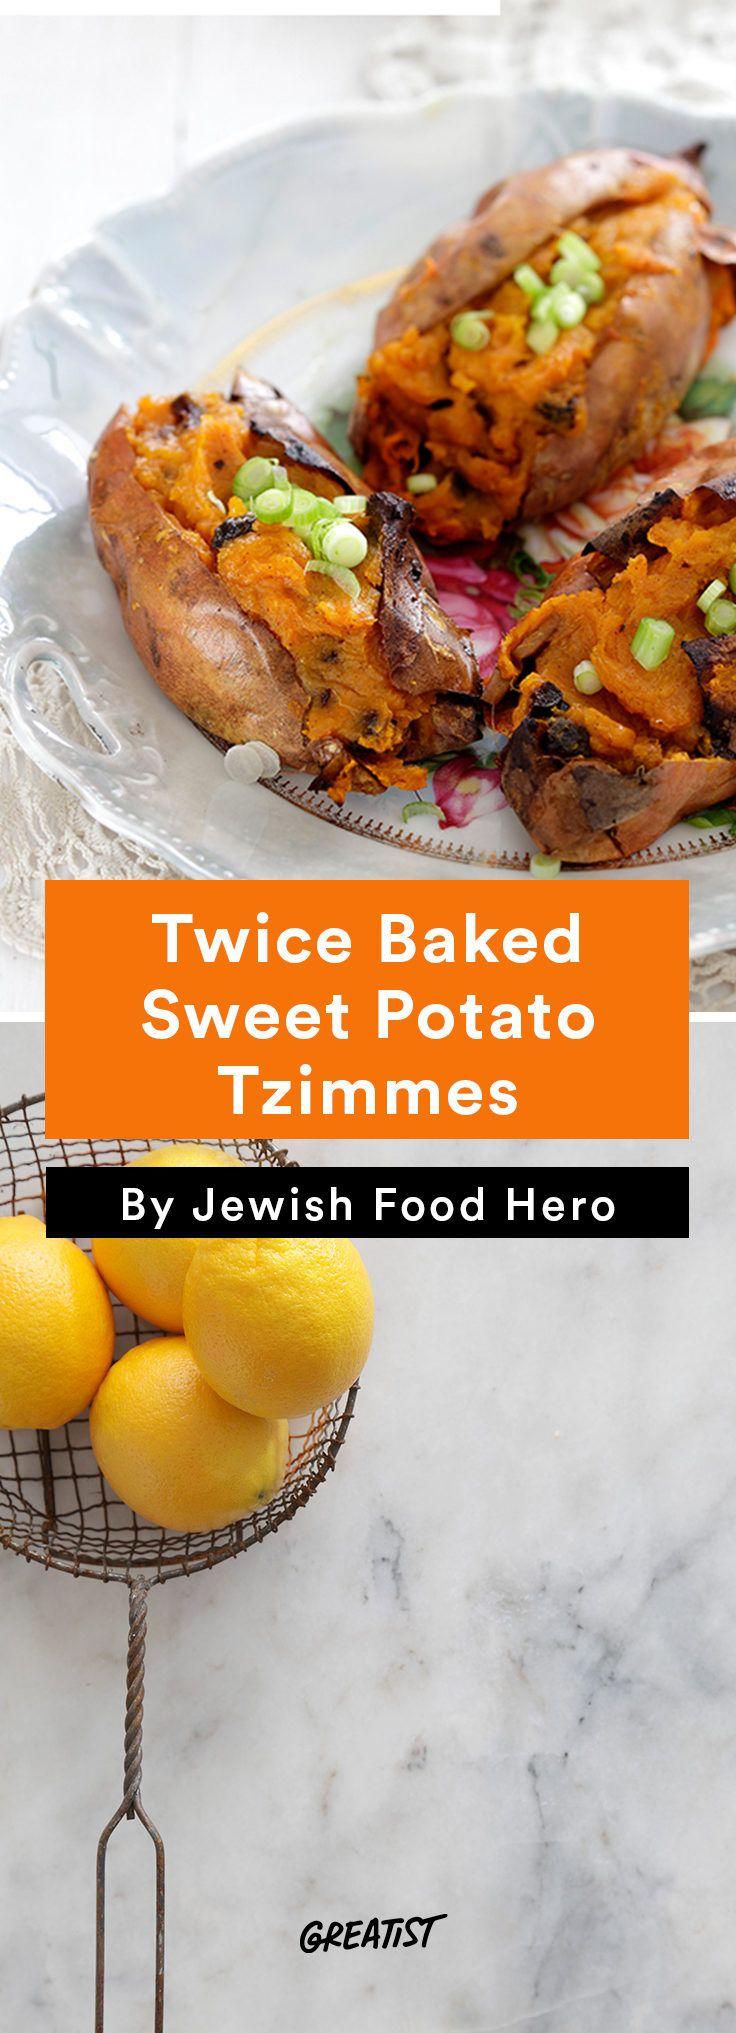 1. Twice-Baked Sweet Potato Tzimmes #vegetarian #kosher #recipes http://greatist.com/eat/jewish-food-recipes-that-revamp-the-classics